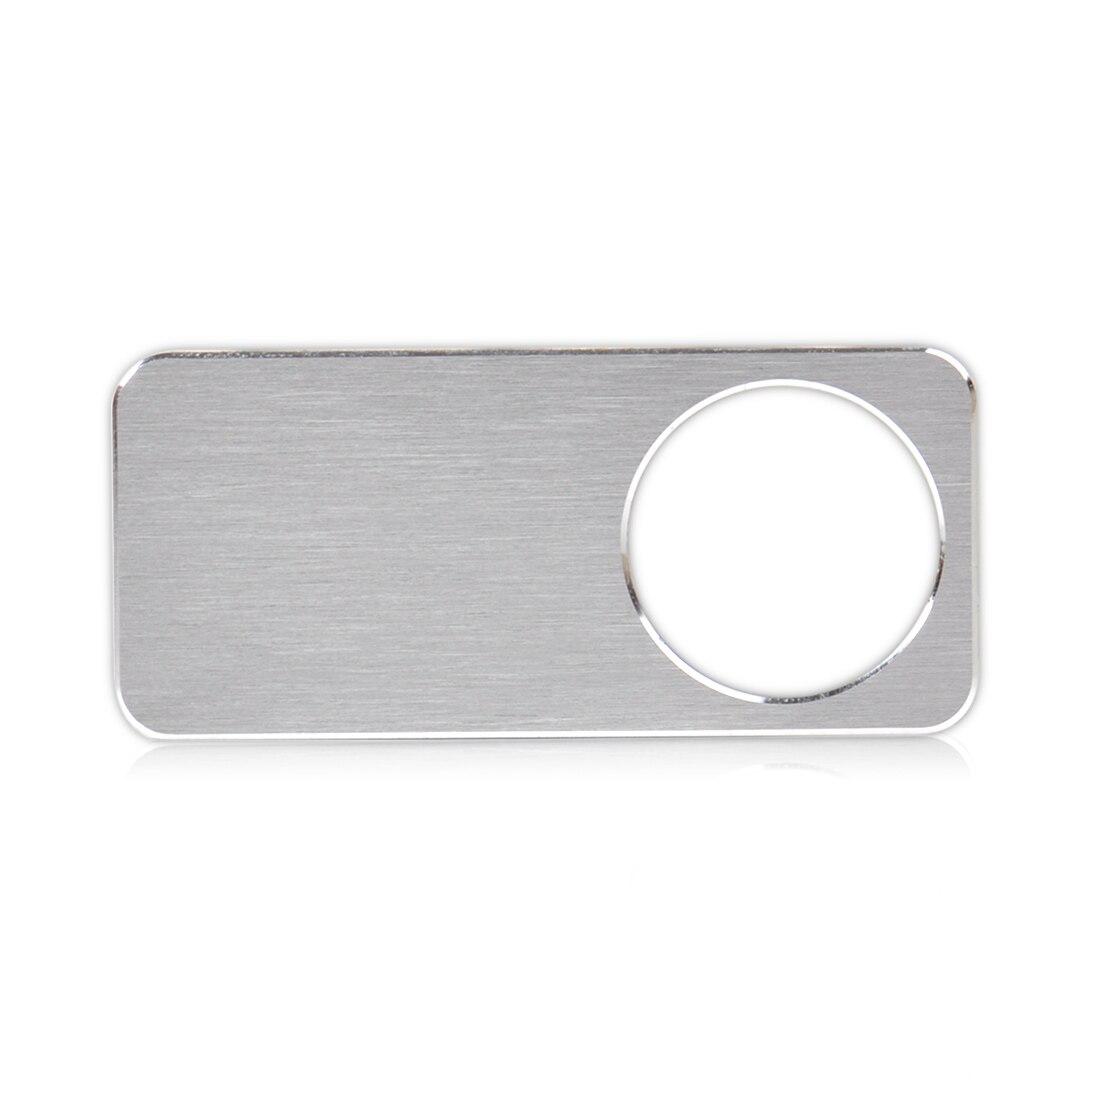 CITALL матовая алюминиевая коробка для хранения перчаток для автомобиля, замок, переключатель, Накладка для Mercedes BENZ C E GLK CLS Class W204 W212 W218 X204